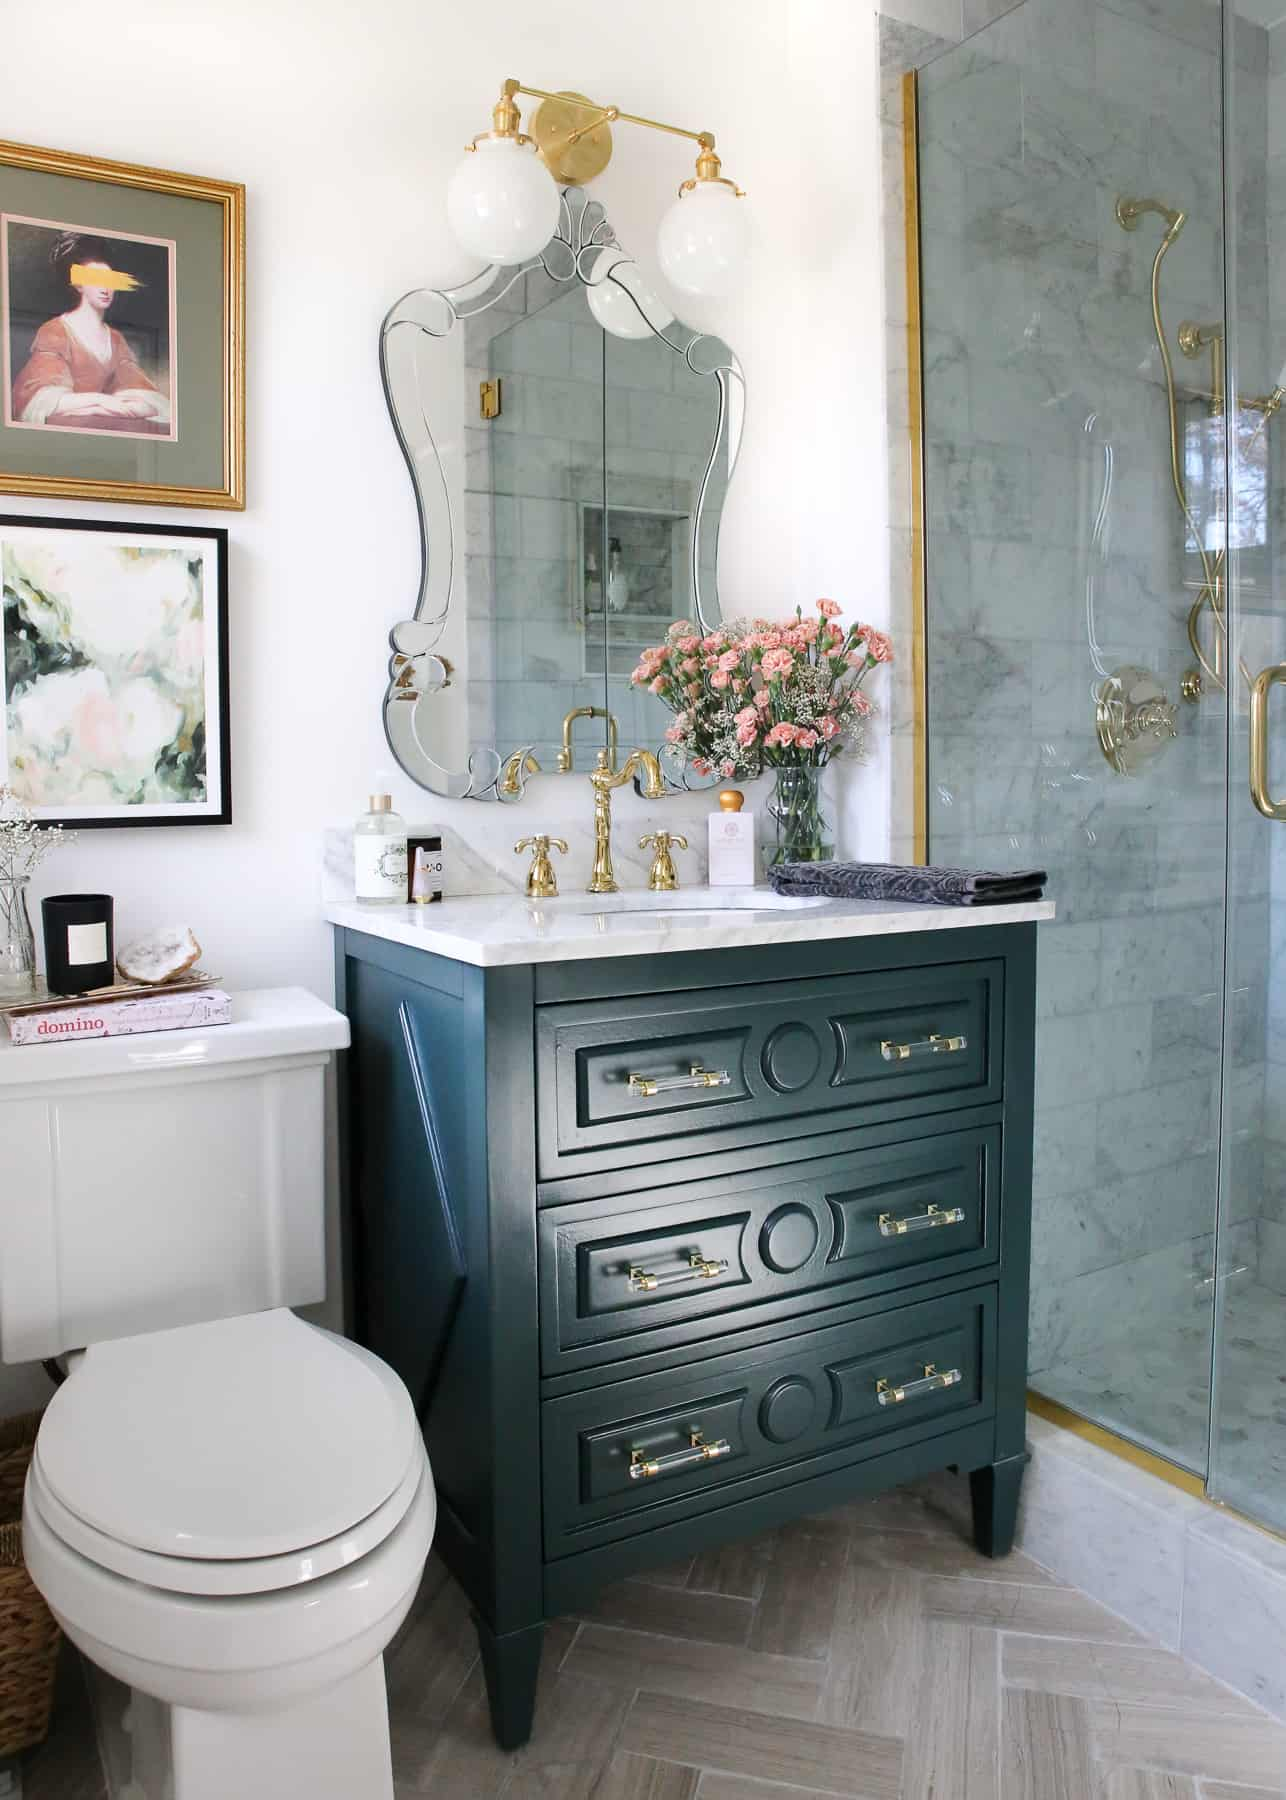 Aglassofbovino bathroom